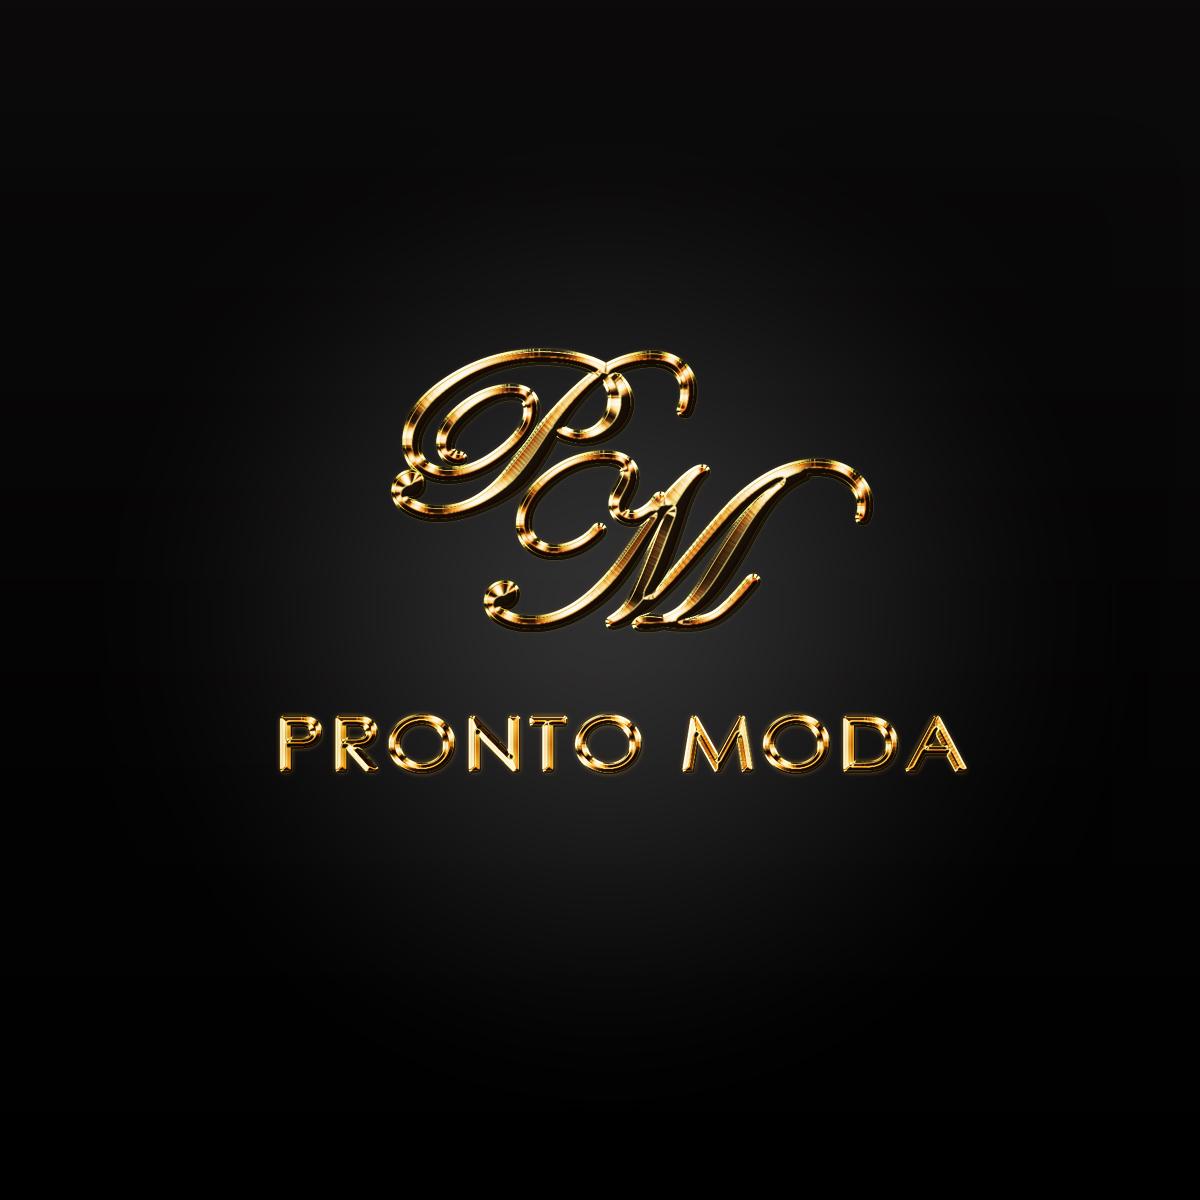 Logo Design by Private User - Entry No. 41 in the Logo Design Contest Captivating Logo Design for Pronto moda.